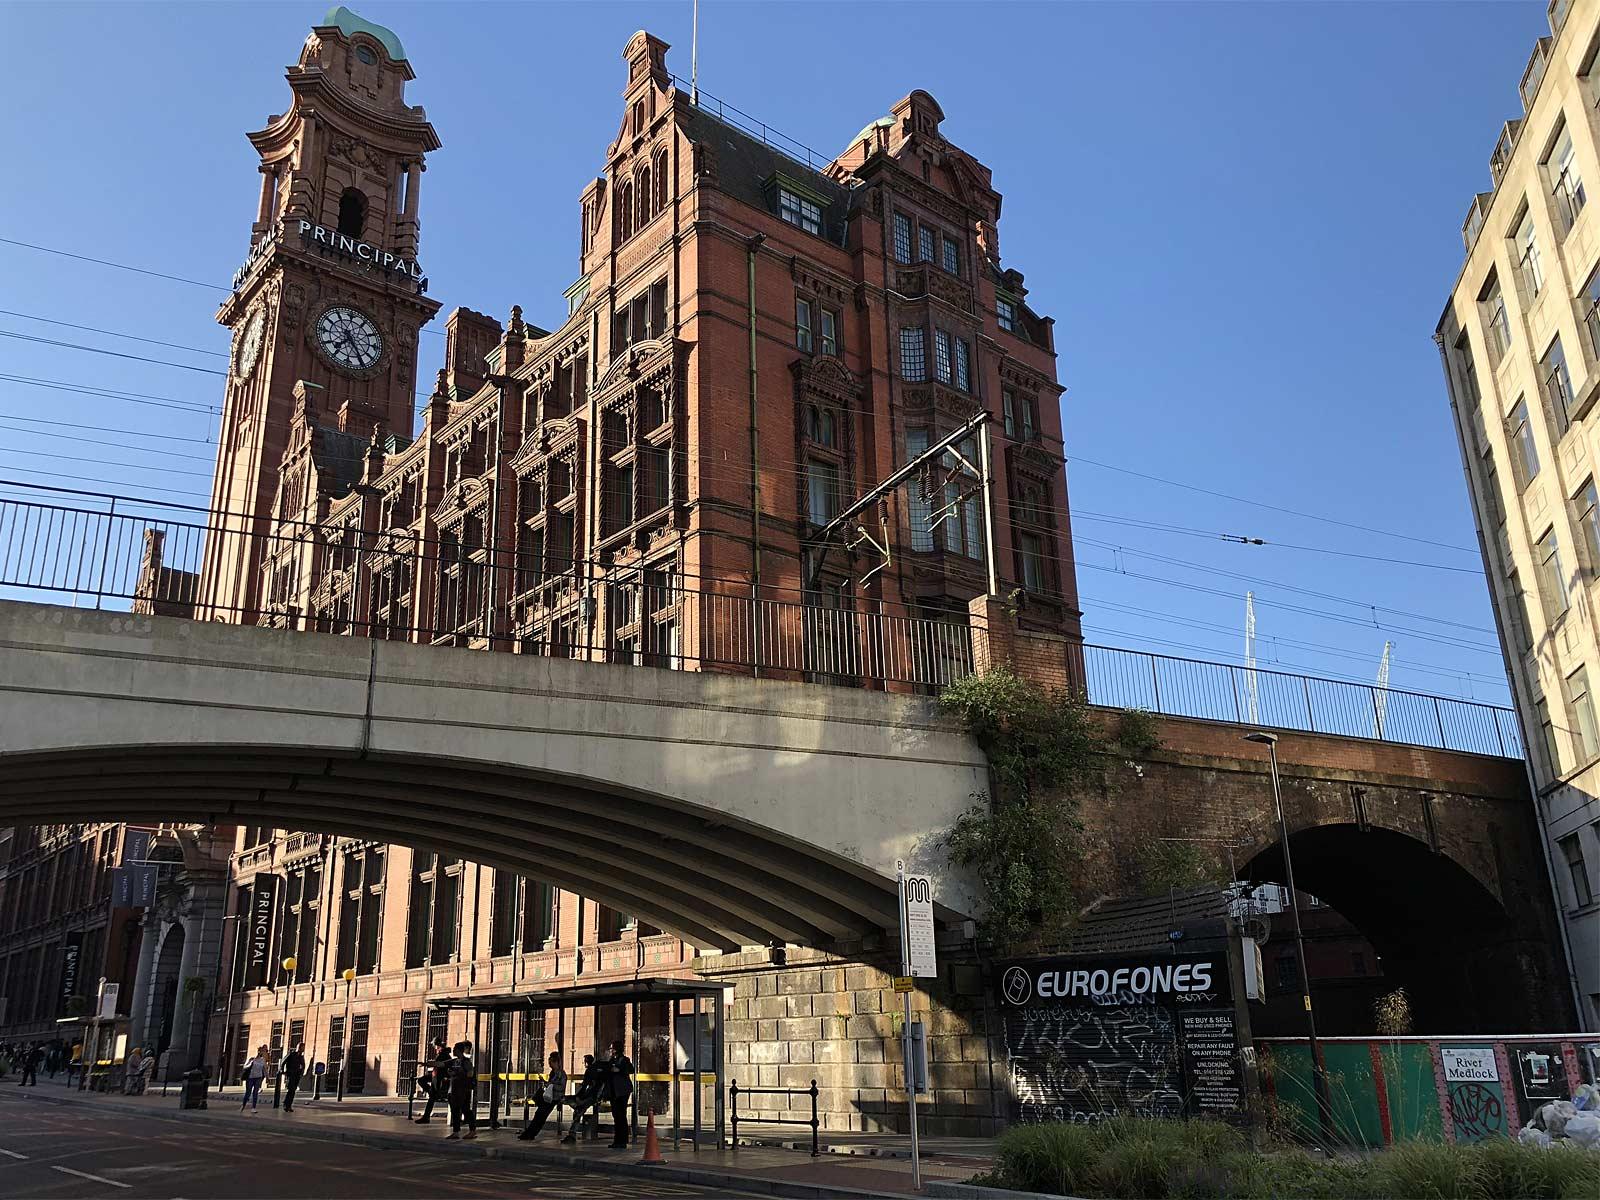 Juni 2018 - Principal Manchester